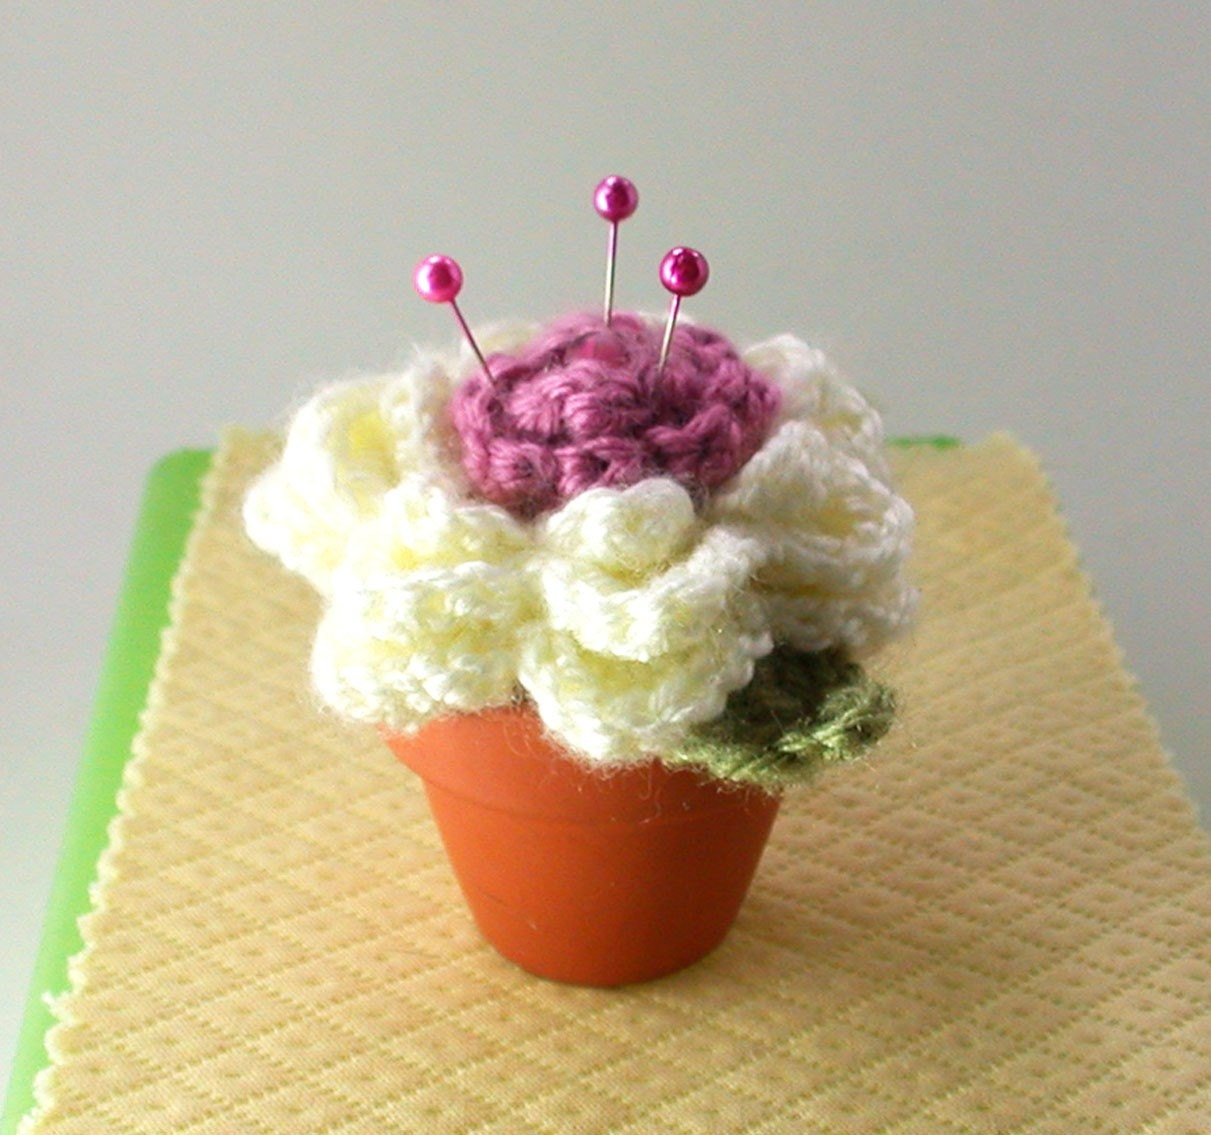 Etsy Amigurumi Cactus : Amigurumi Cactus Flower Mini Pincushion by BettysWorld on Etsy